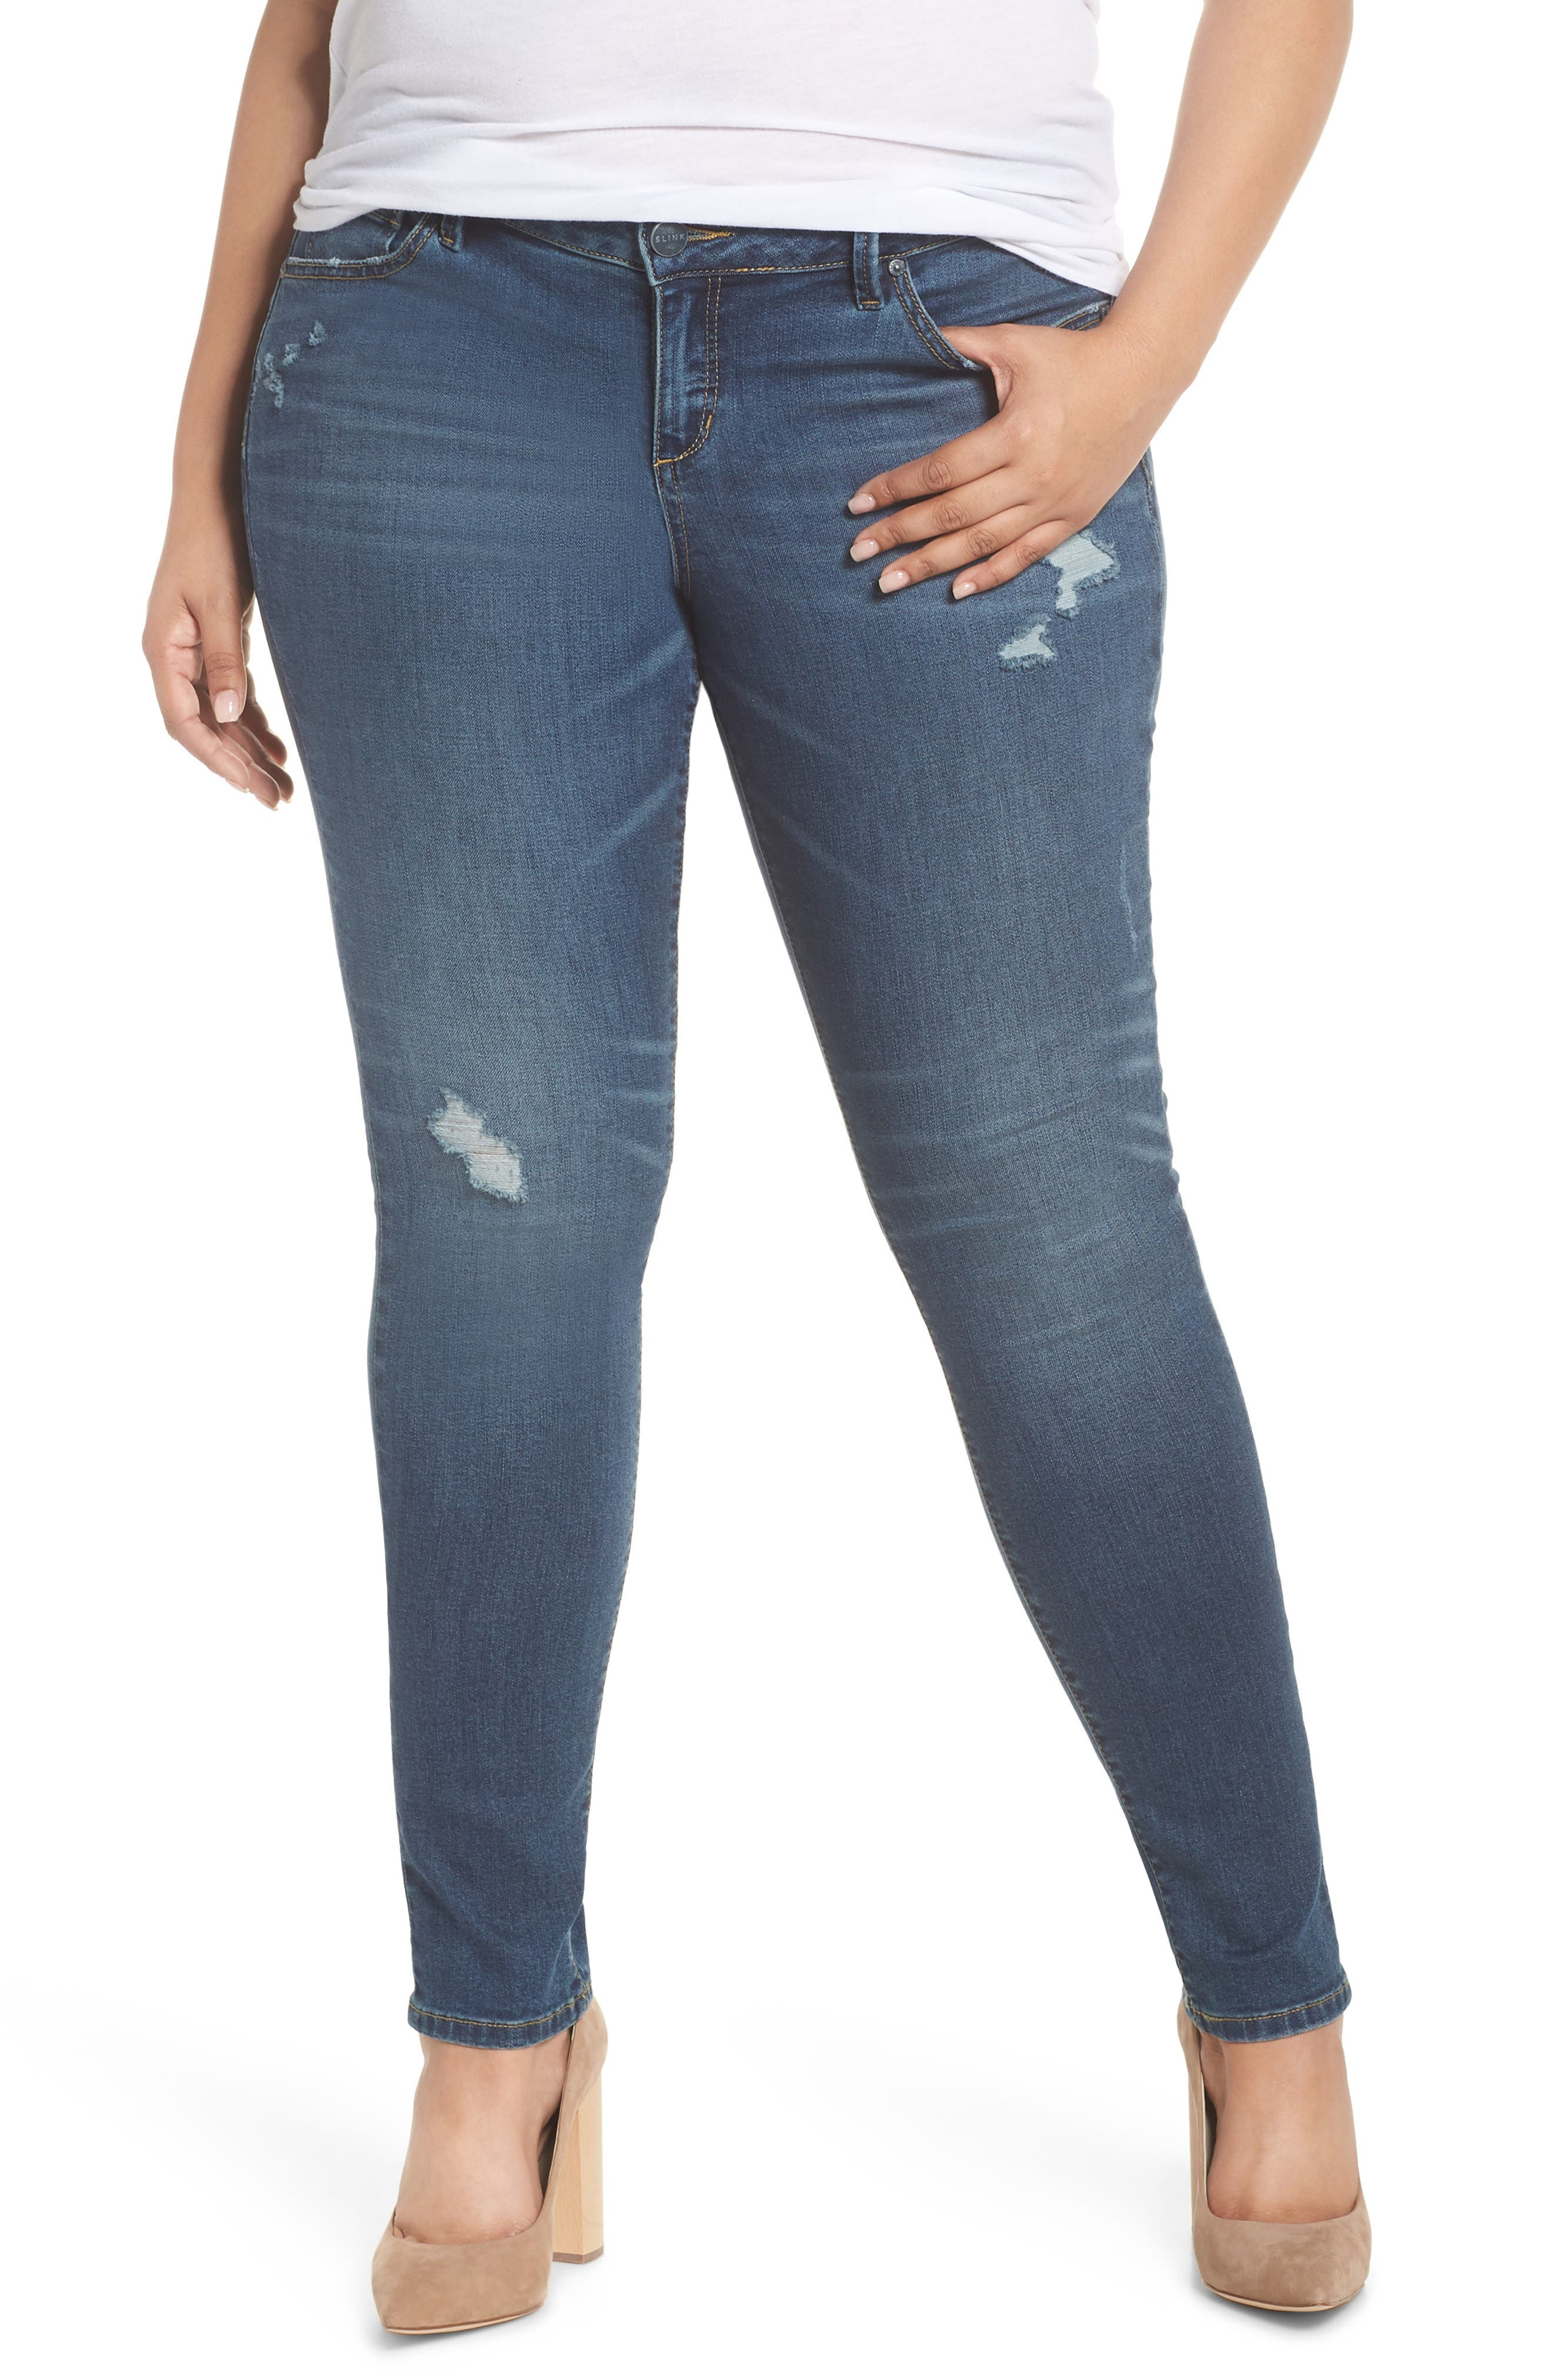 Plus Women's Slink Jeans Stretch Skinny Jeans